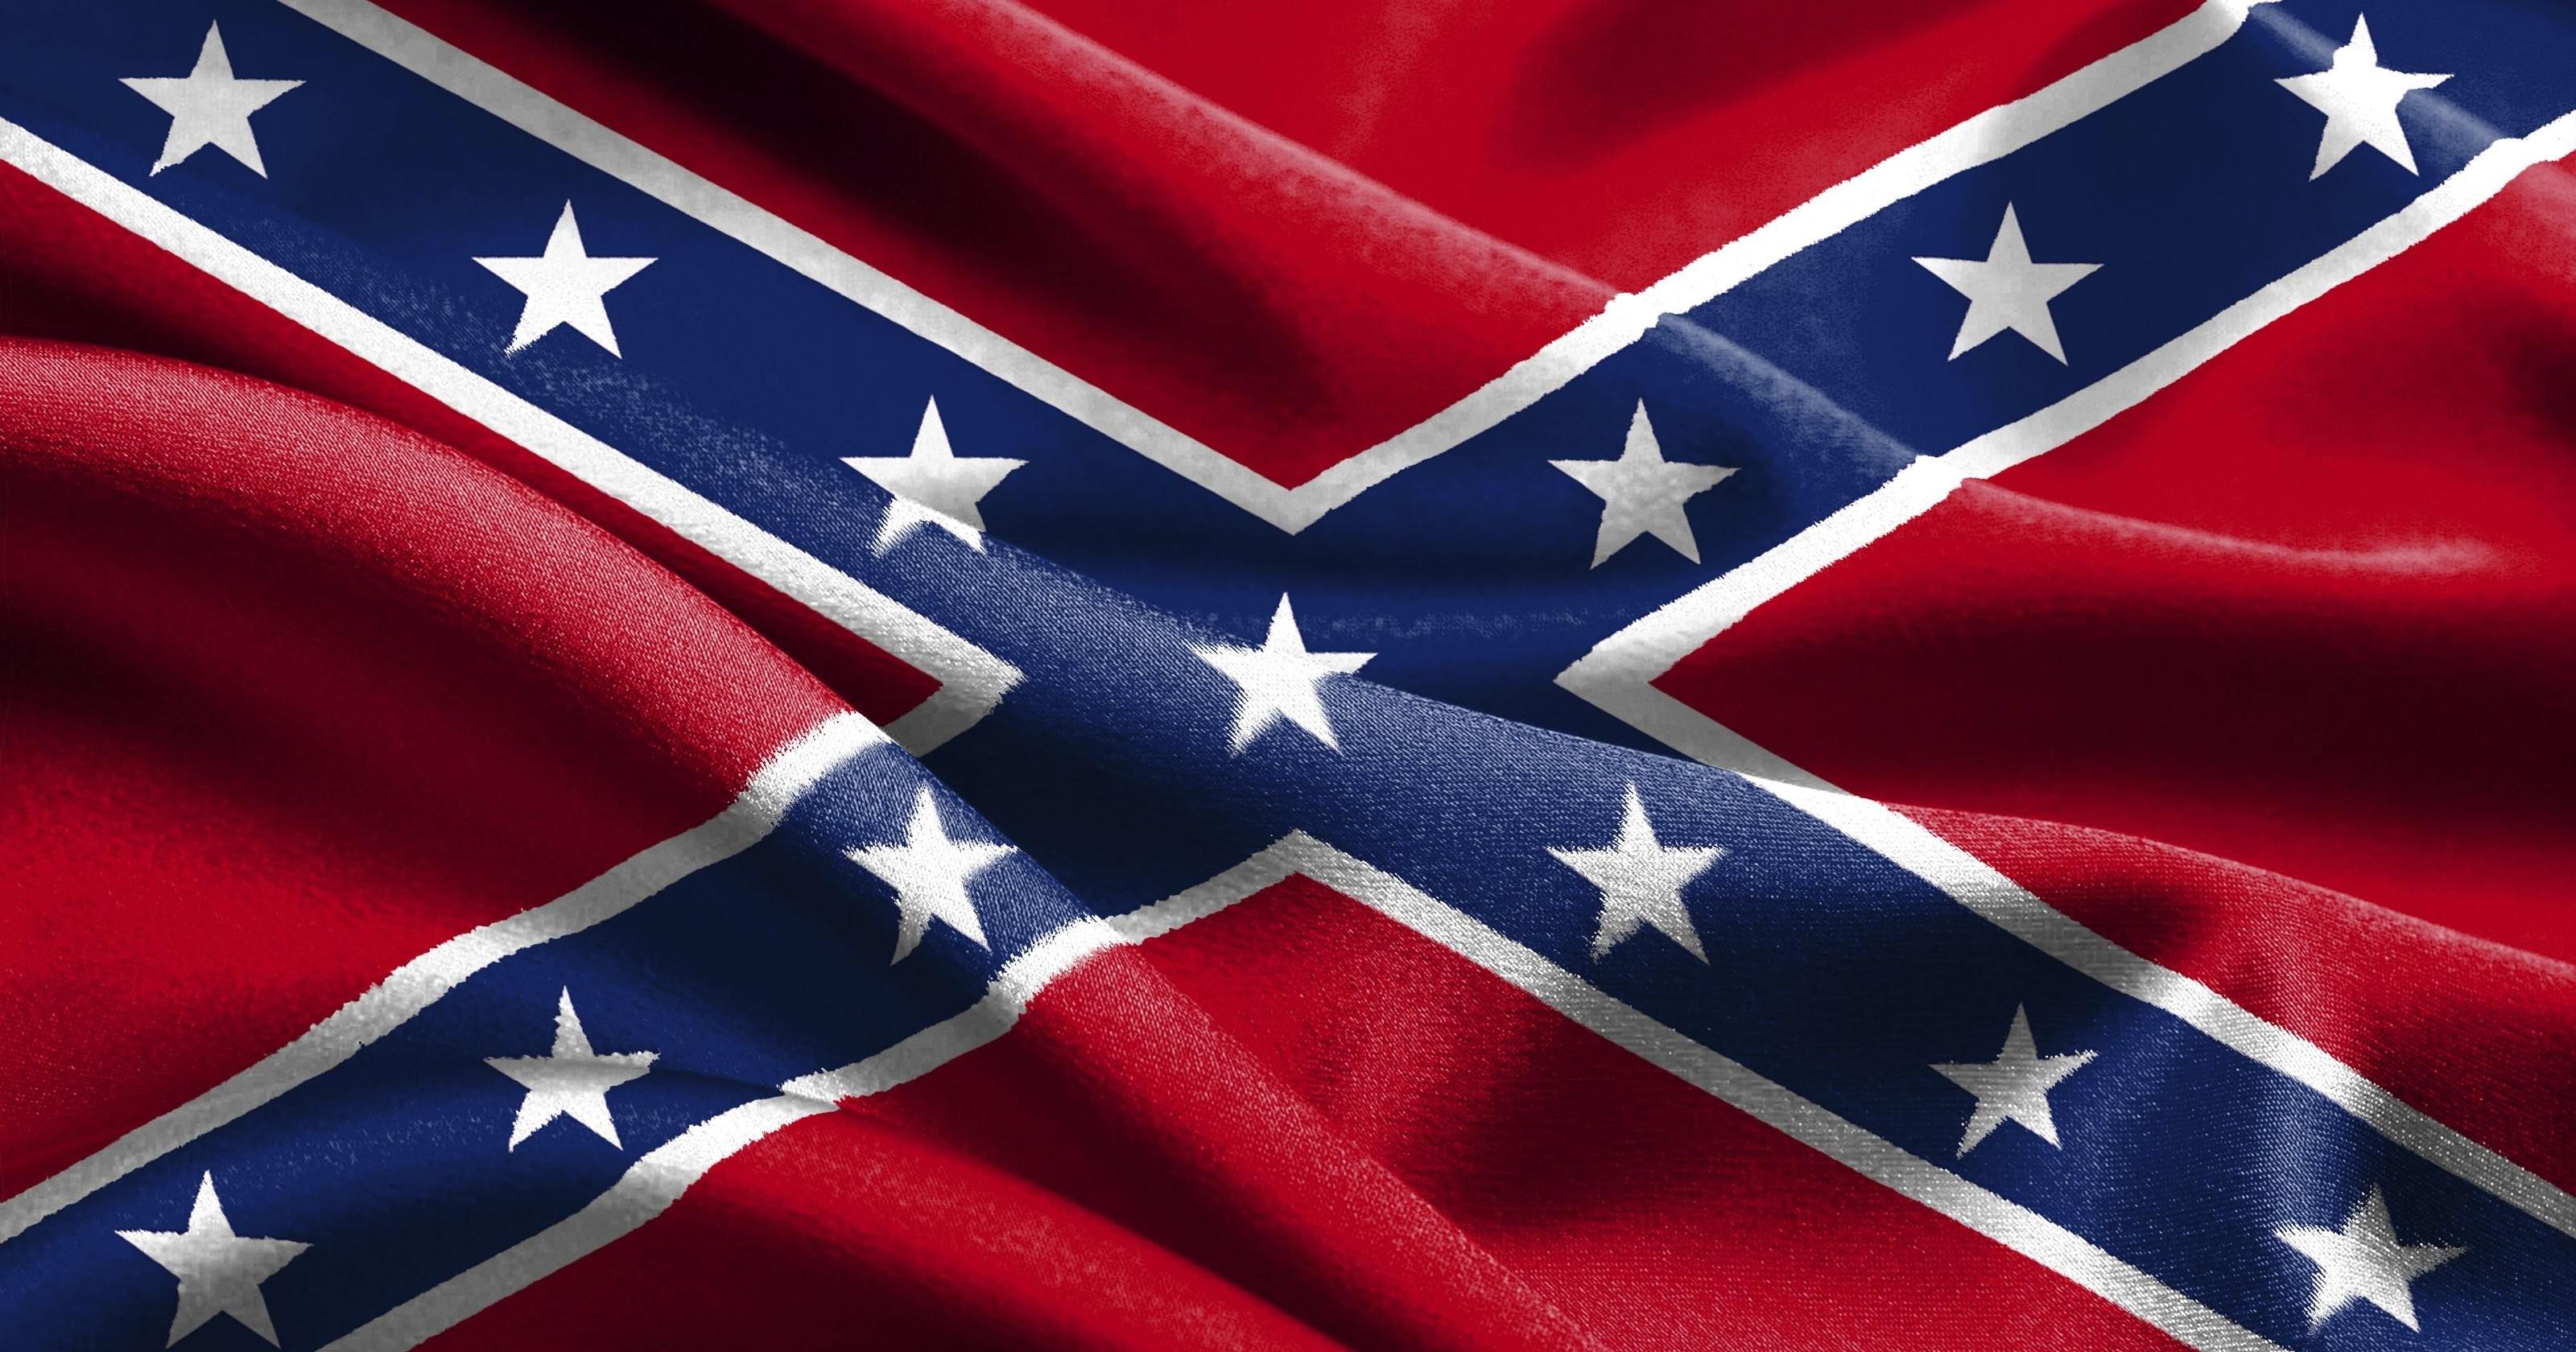 1920x1200 United States Flag